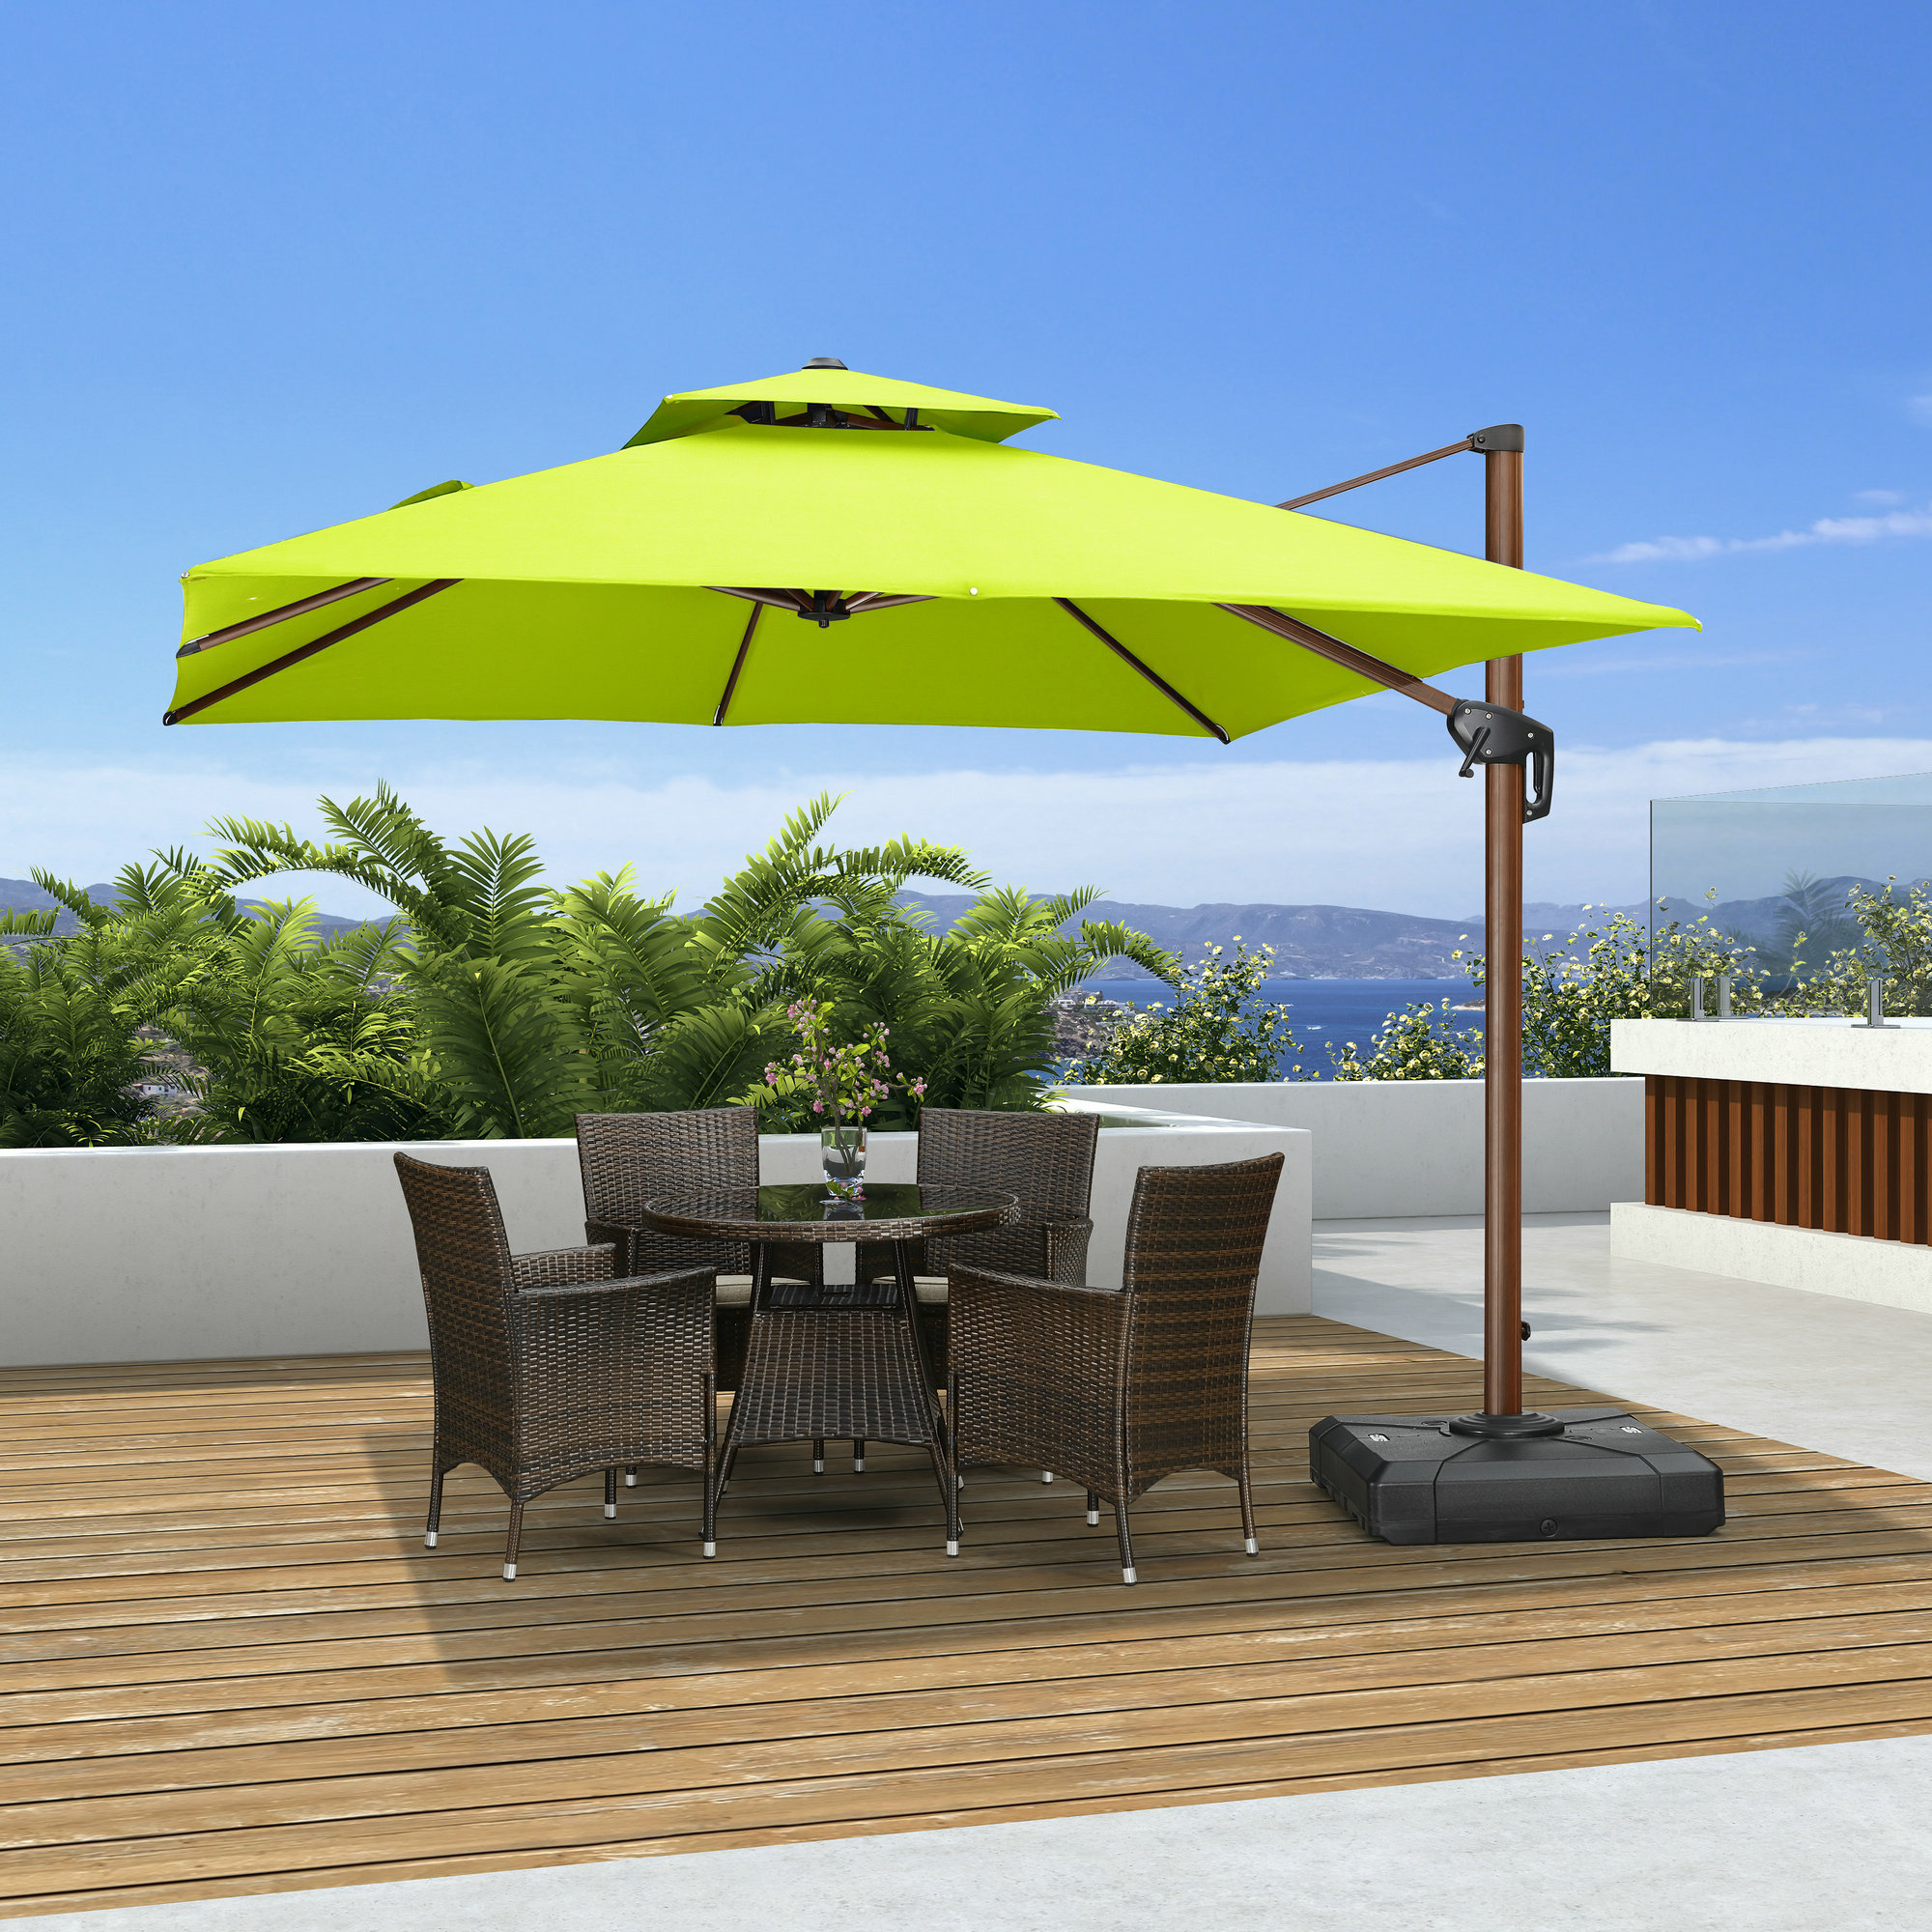 Spitler Square Cantilever Umbrellas Throughout 2020 Waddell 10' Square Cantilever Umbrella (View 15 of 20)